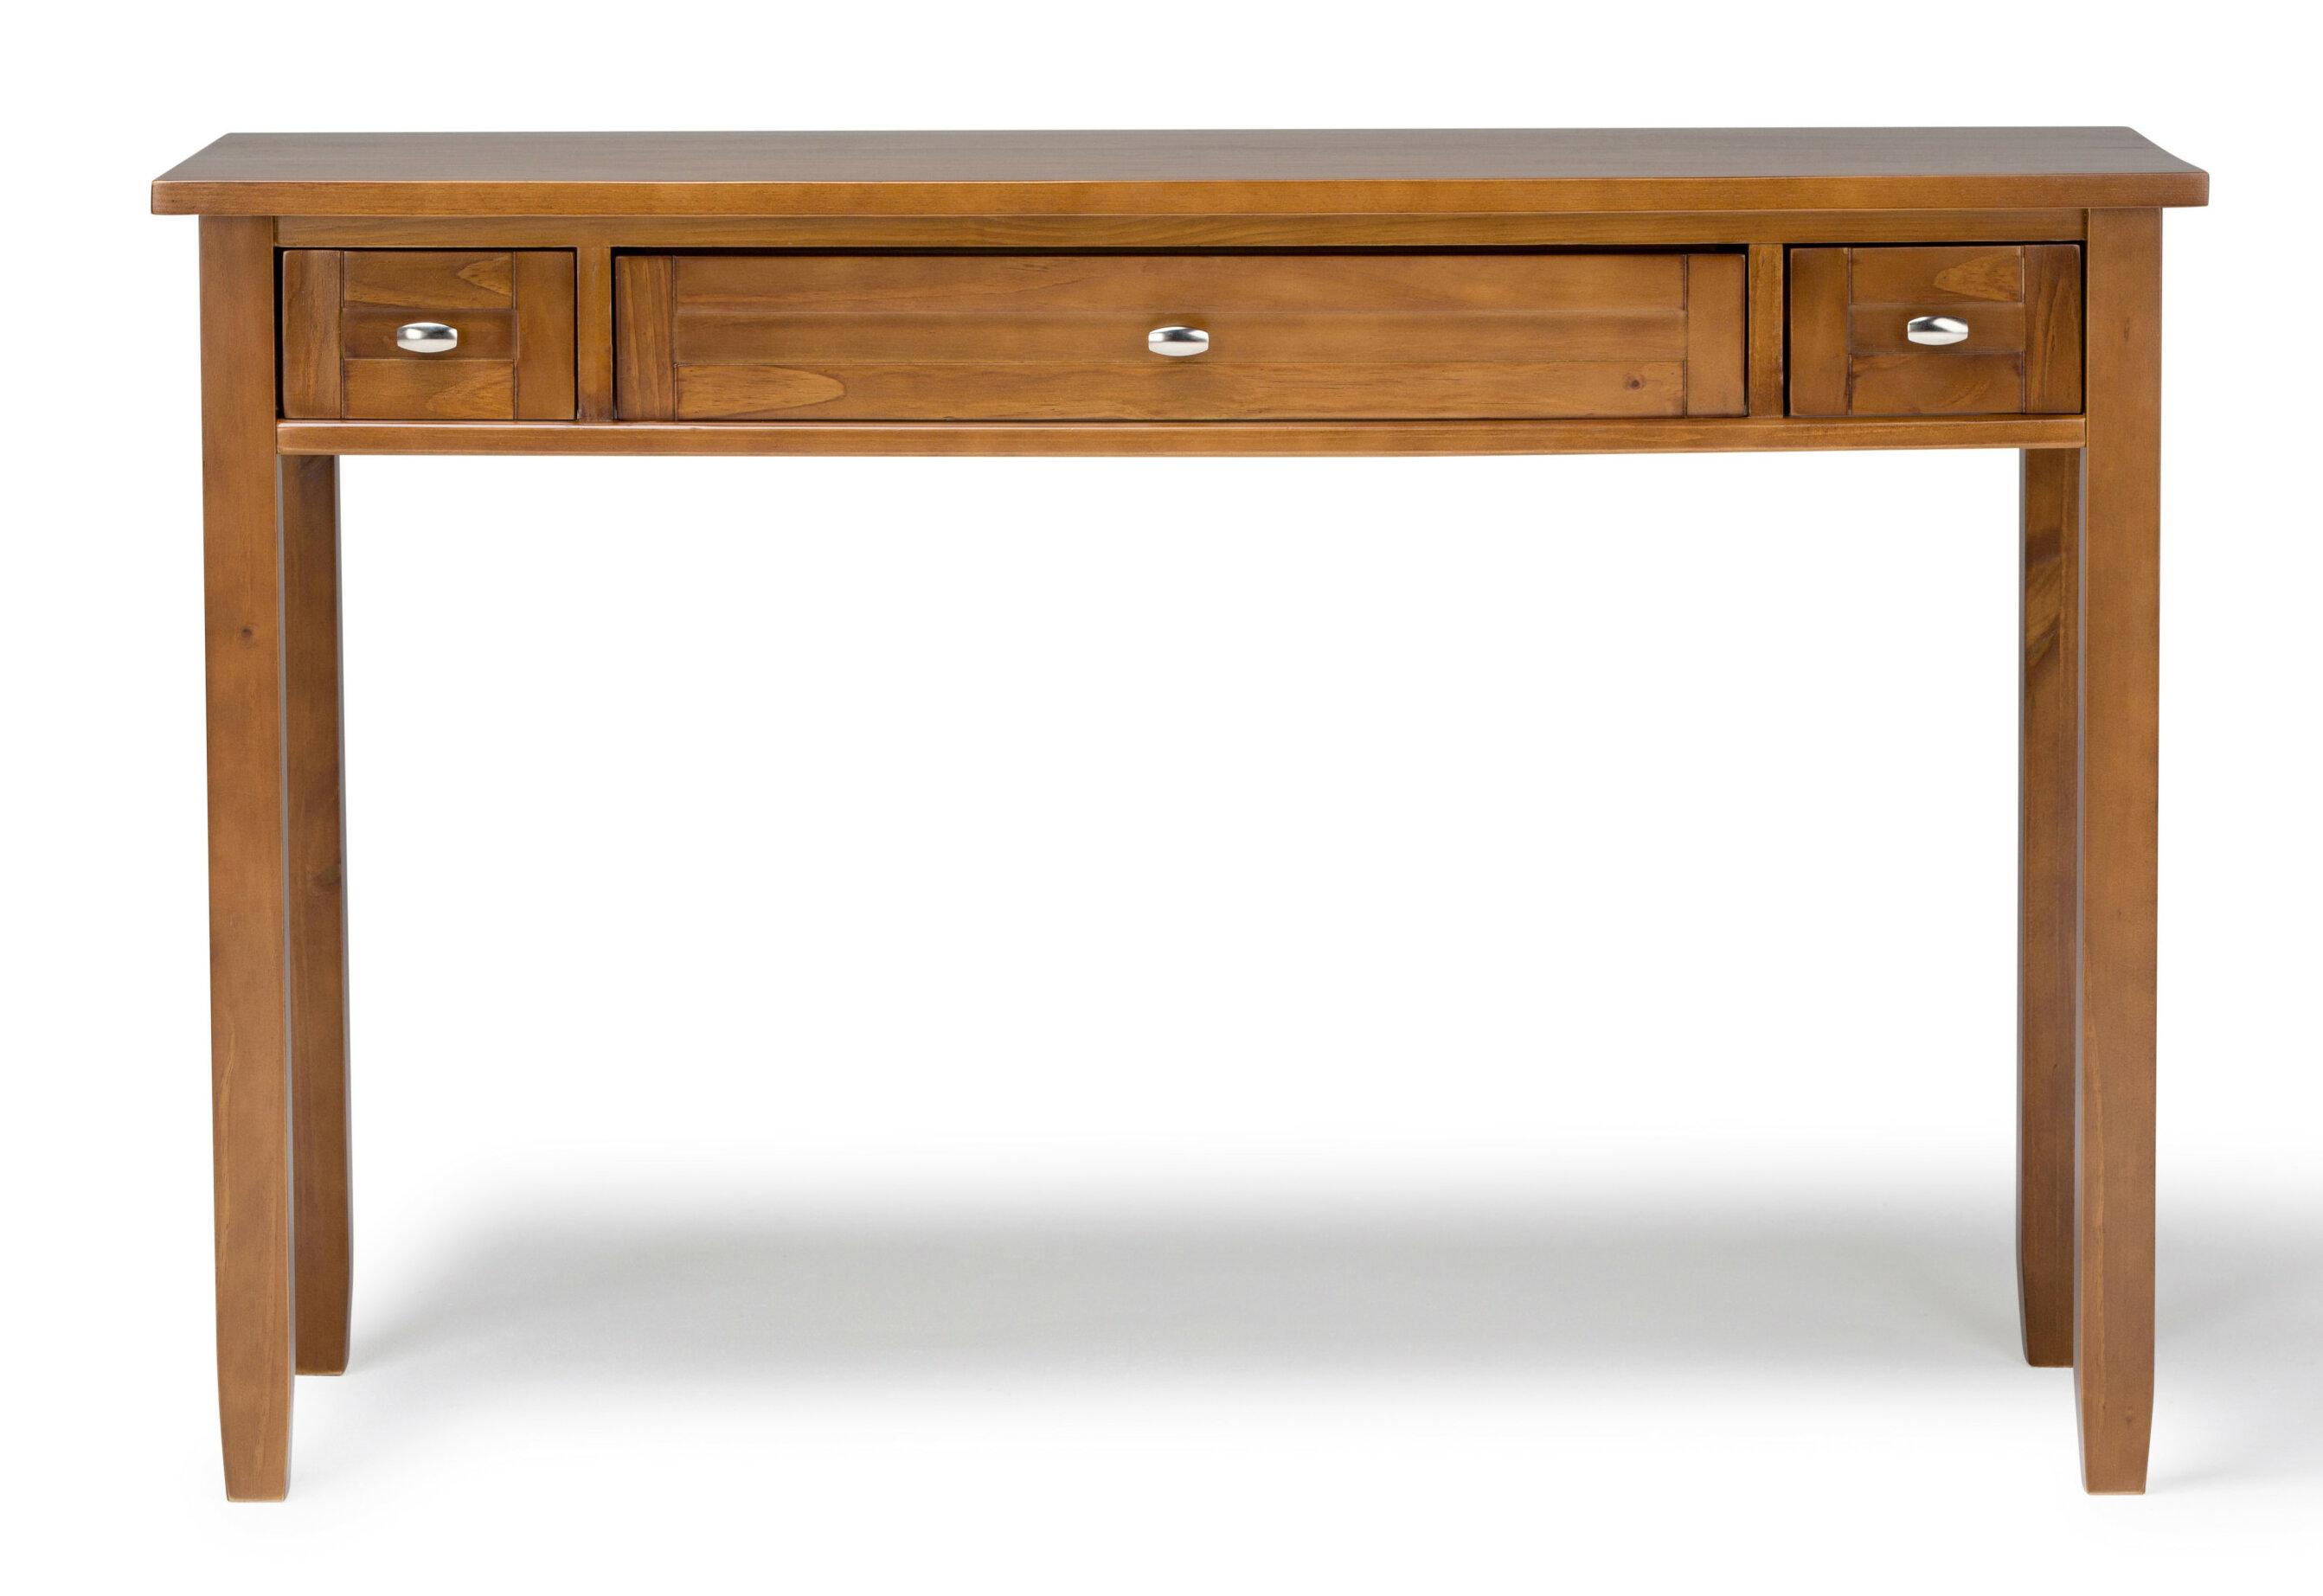 Awe Inspiring Alameda Solid Wood Desk Download Free Architecture Designs Scobabritishbridgeorg